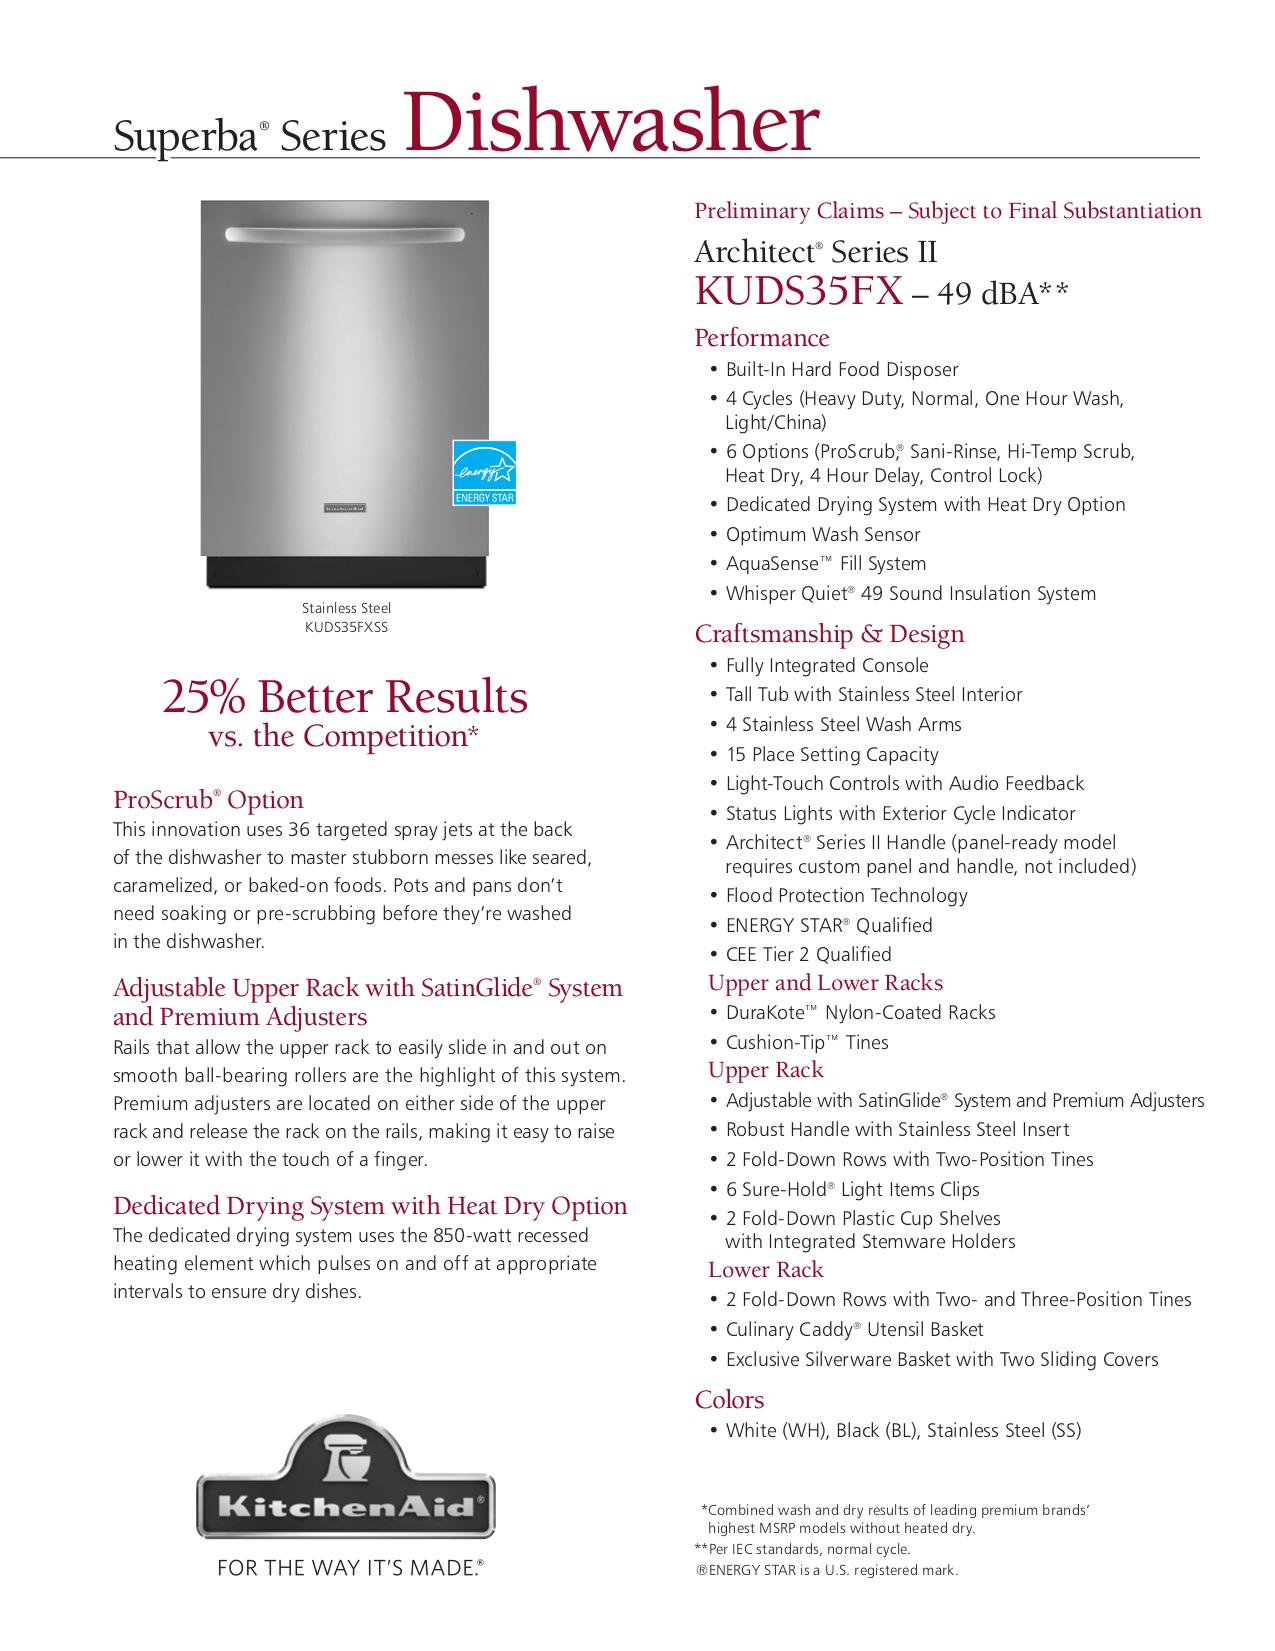 download free pdf for kitchenaid kuds35fx dishwasher manual rh umlib com kitchenaid appliance user manuals kitchenaid dishwasher manuals online